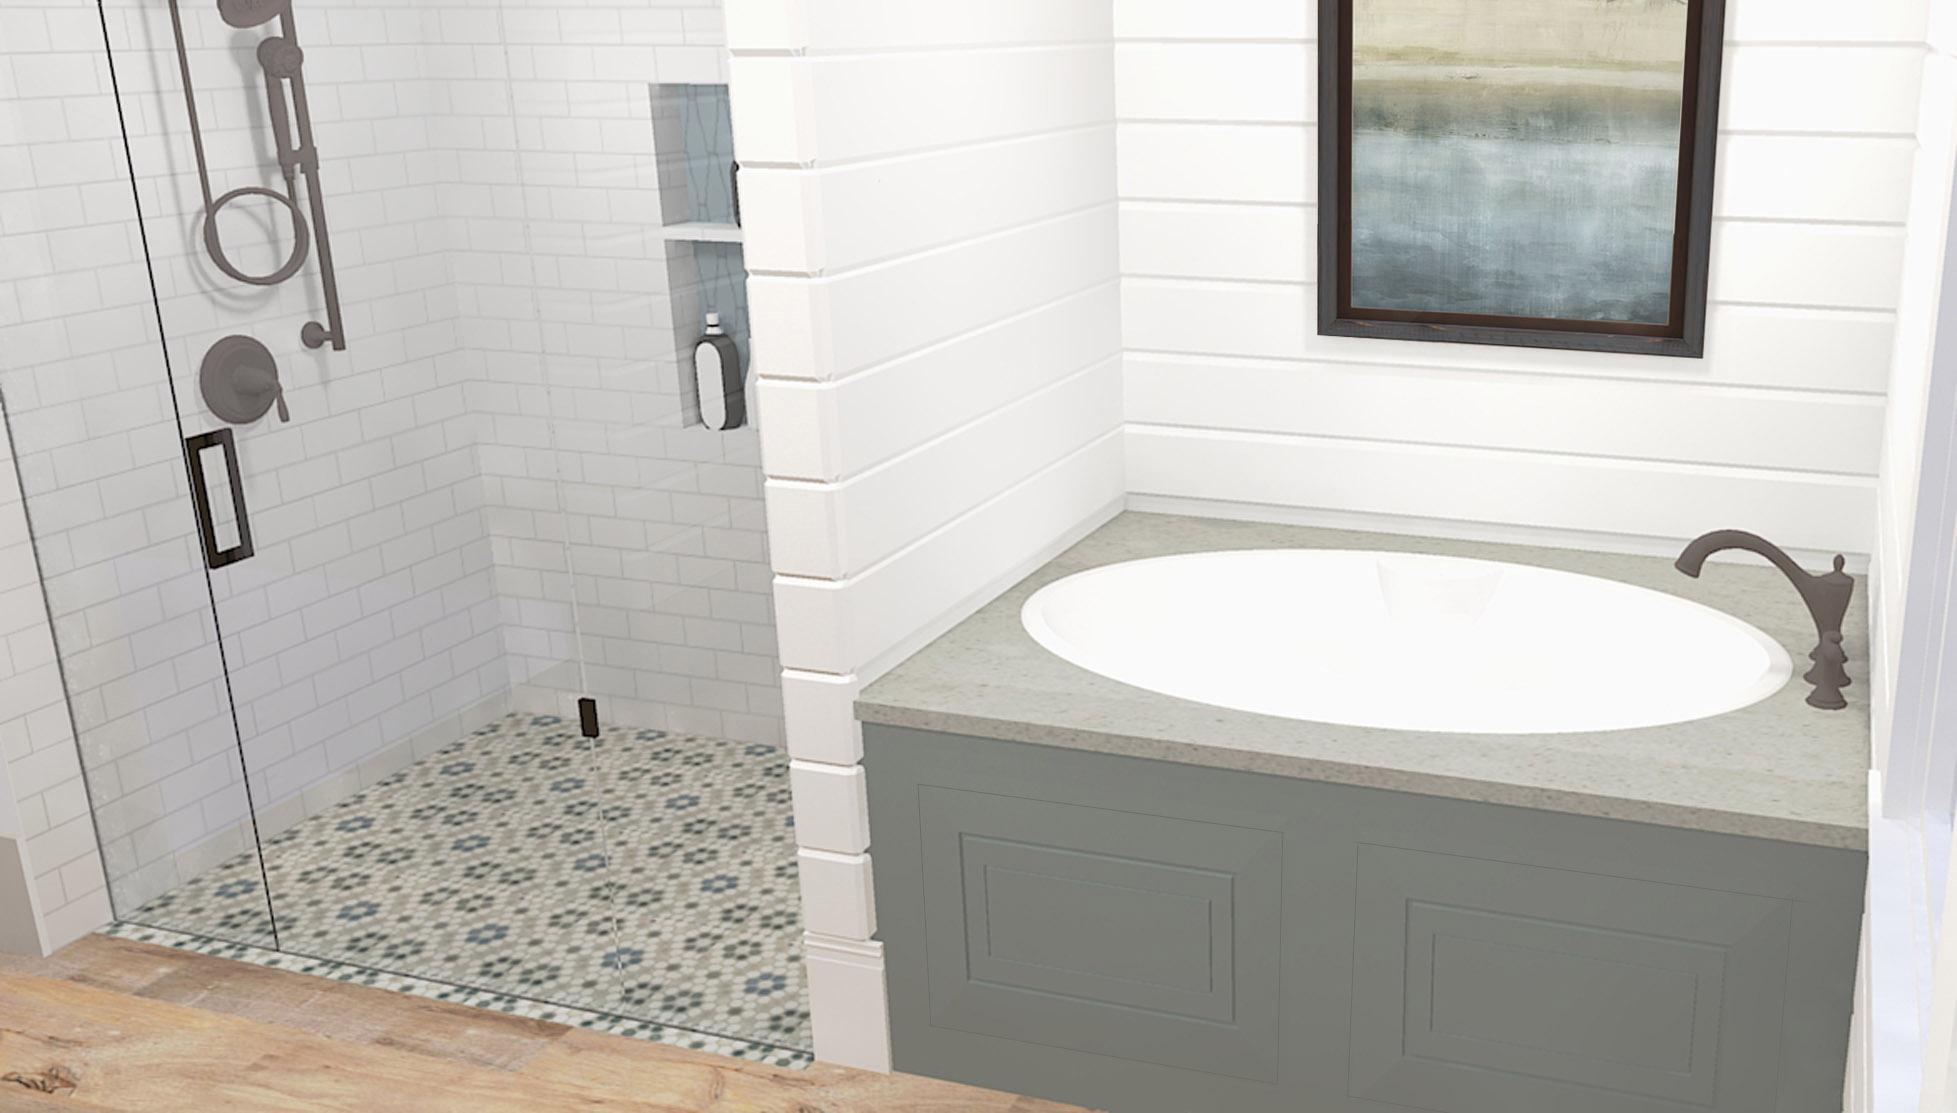 Master bathroom concept rendering - April 2016